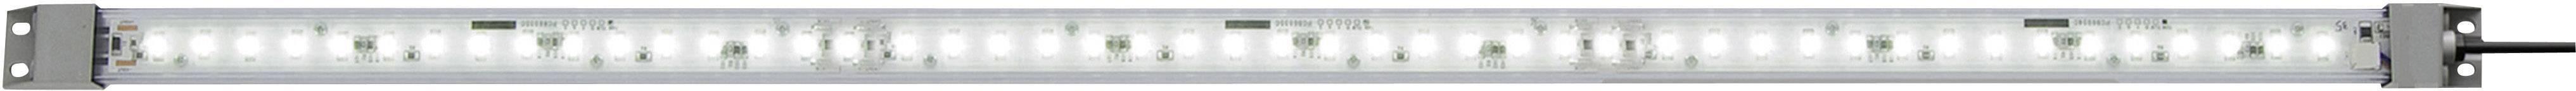 Idec LF1B-NE3P-2THWW2-3M, biela, 900 lm, 13 W, 24 V/DC